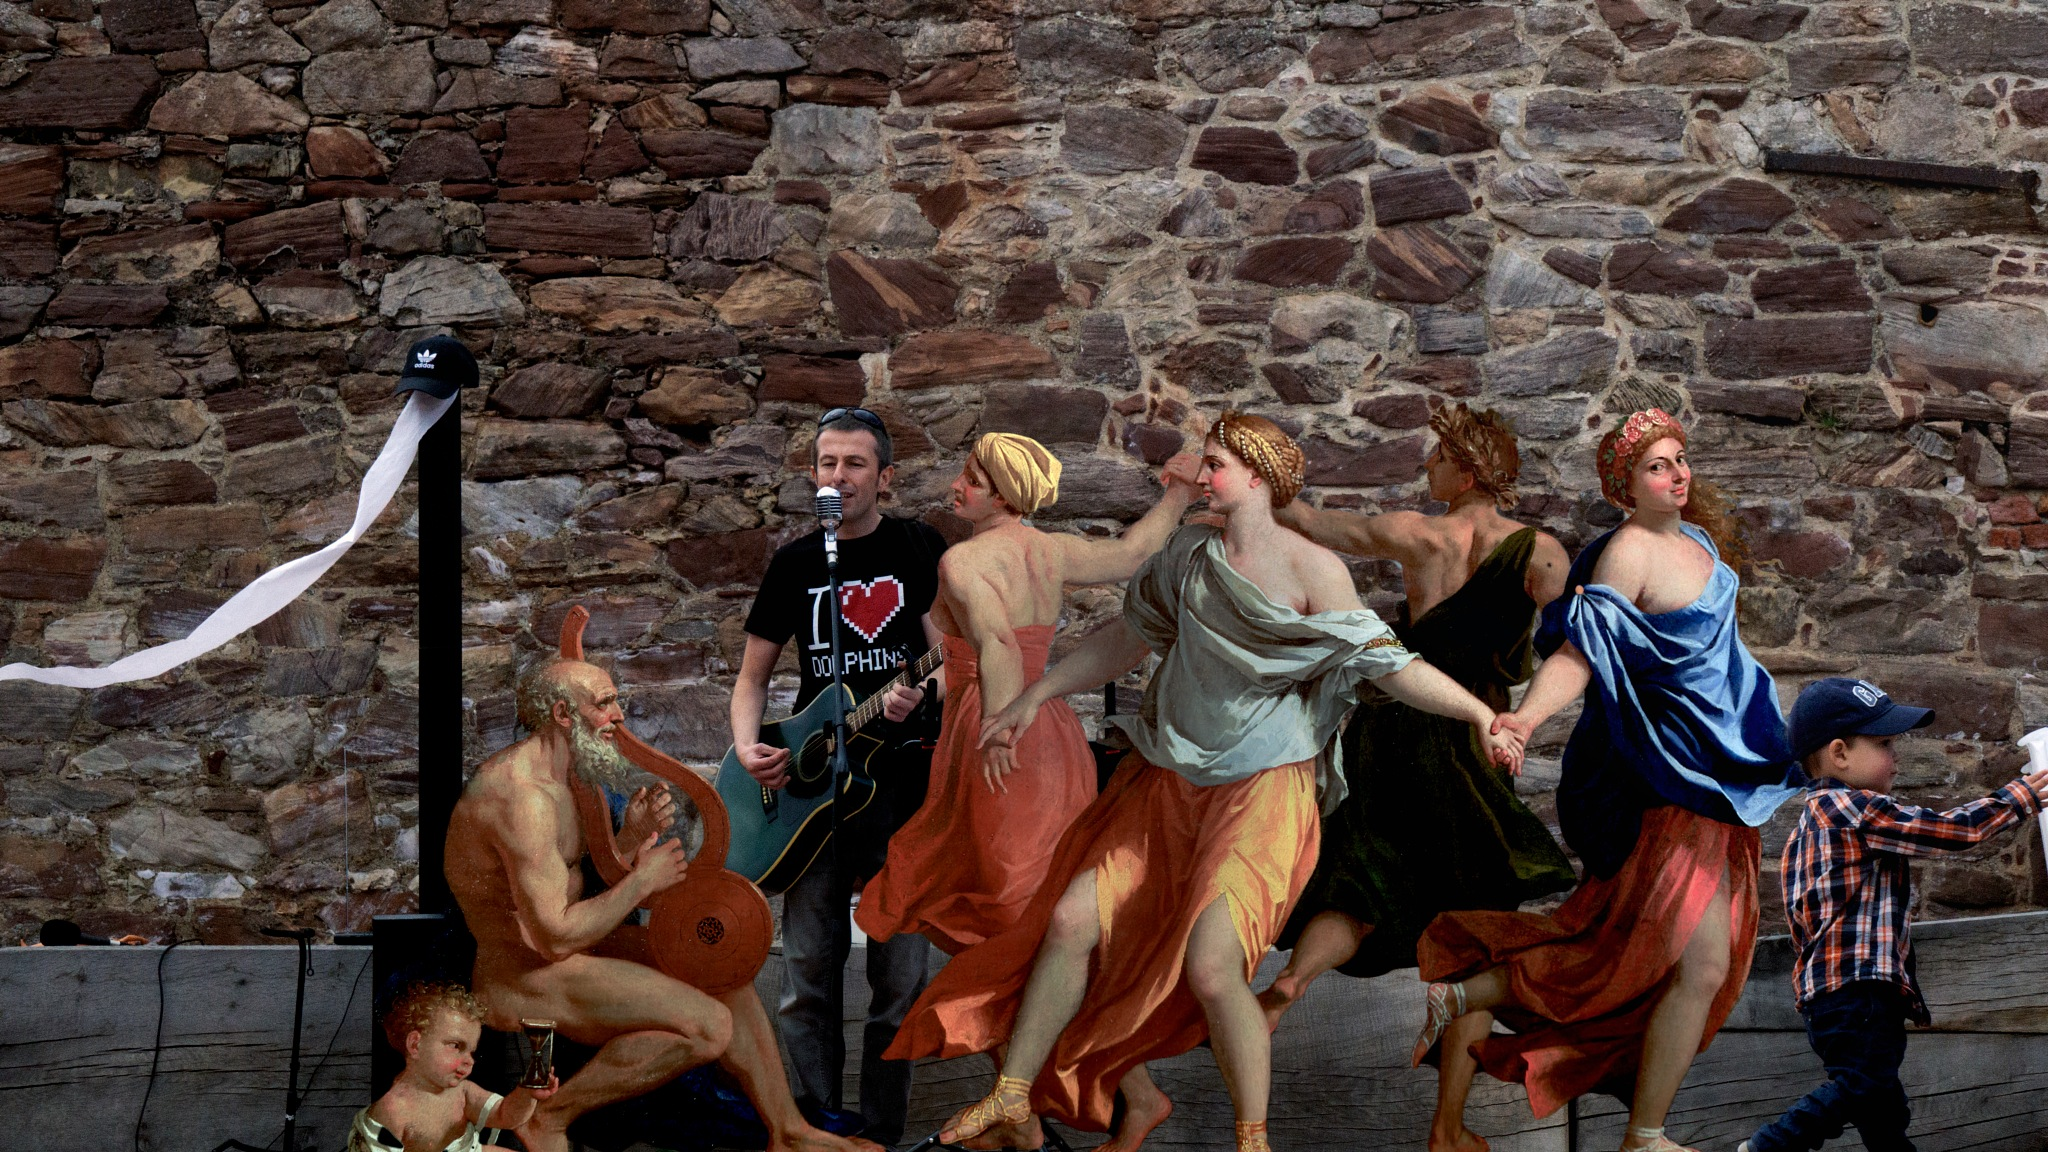 Jon & Plato jammin' with the Platlettes by David Drummond